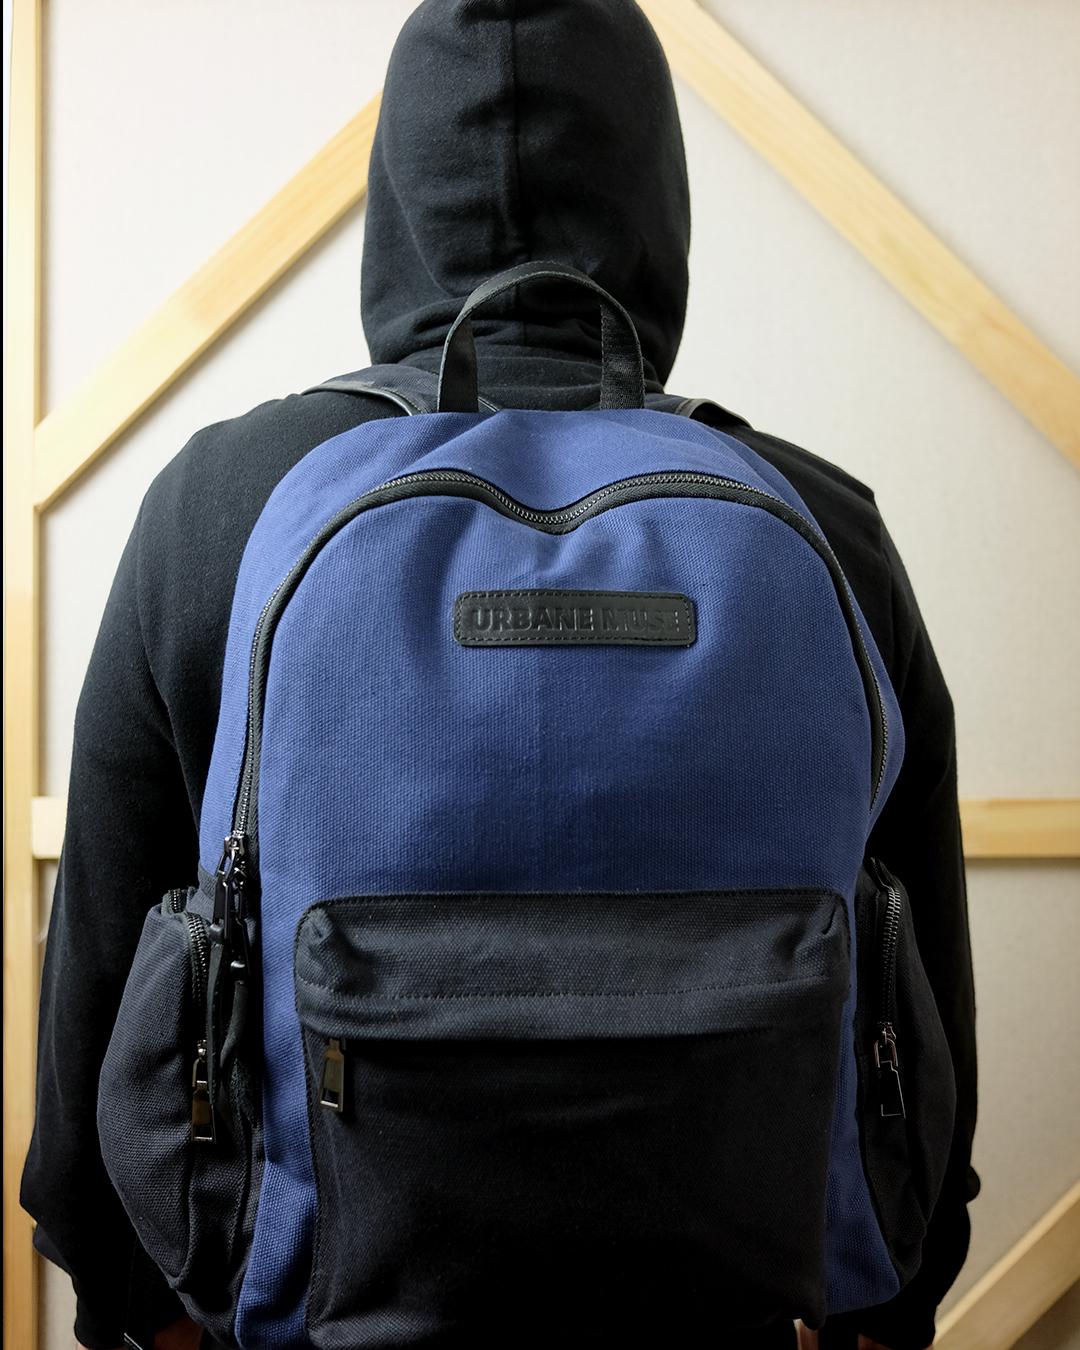 photo-1-Modeling-Blue-Cotton-Backpack-URBANE-MUSE-CHRIS-SMITH